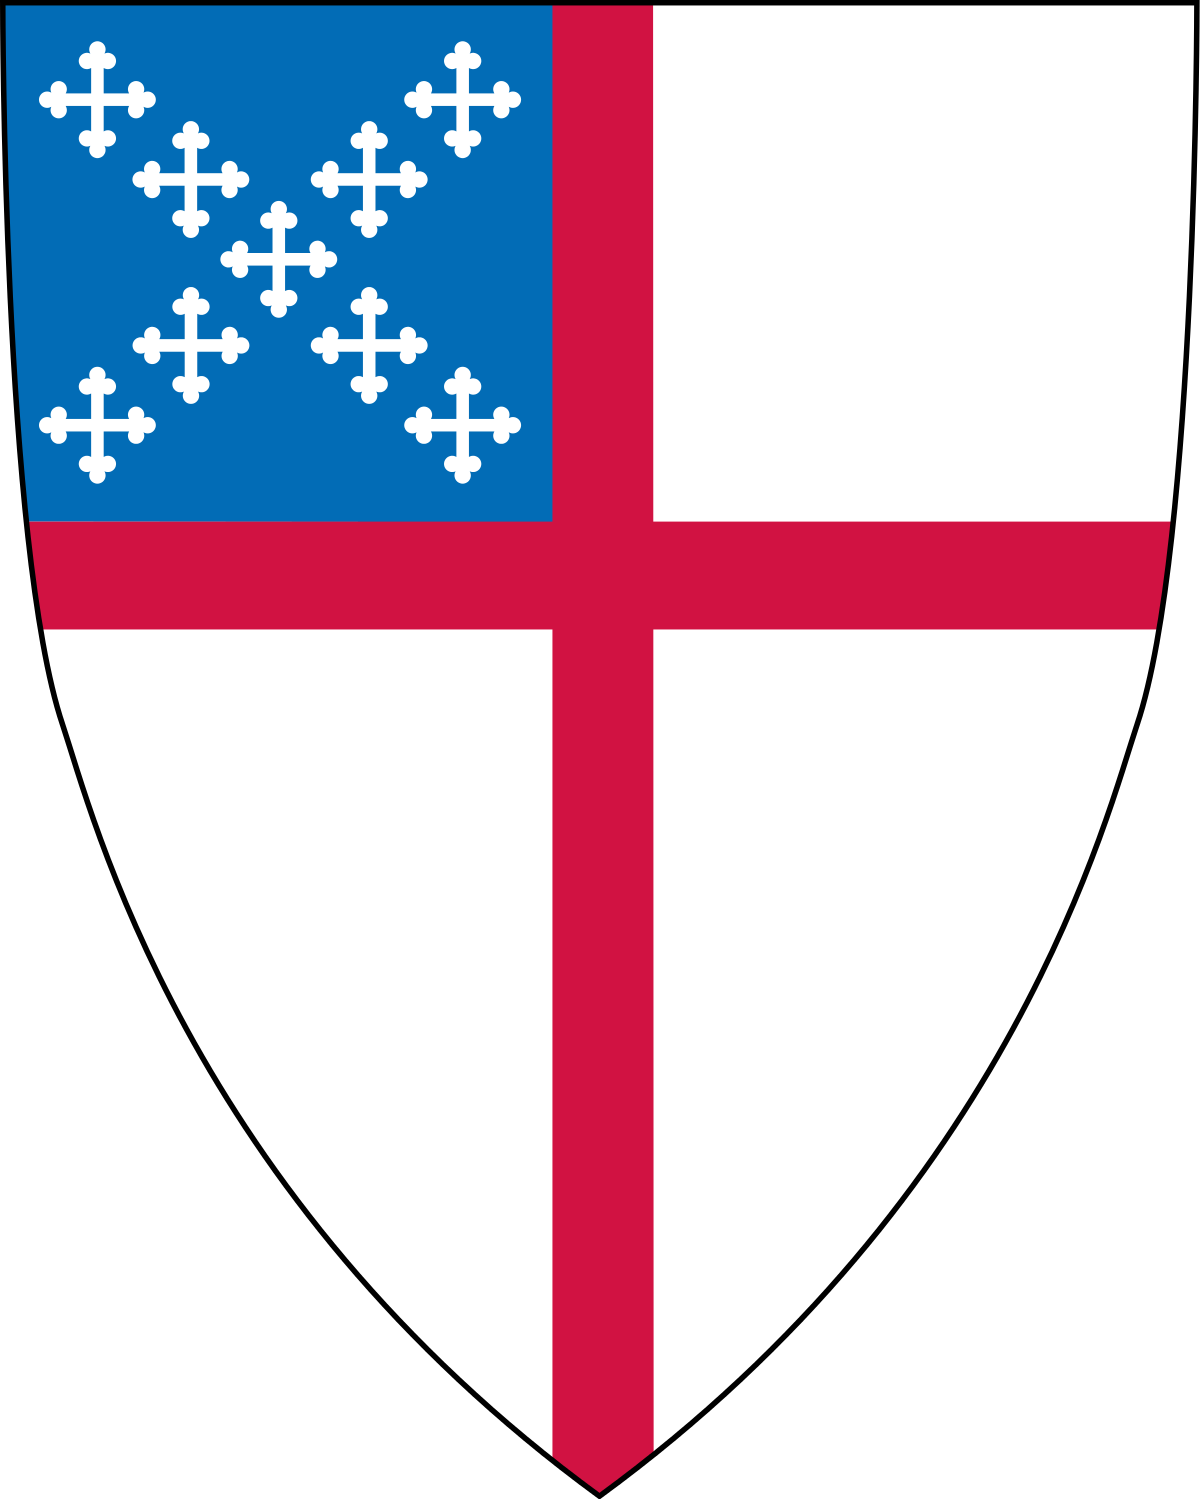 Episcopal Church (United States).